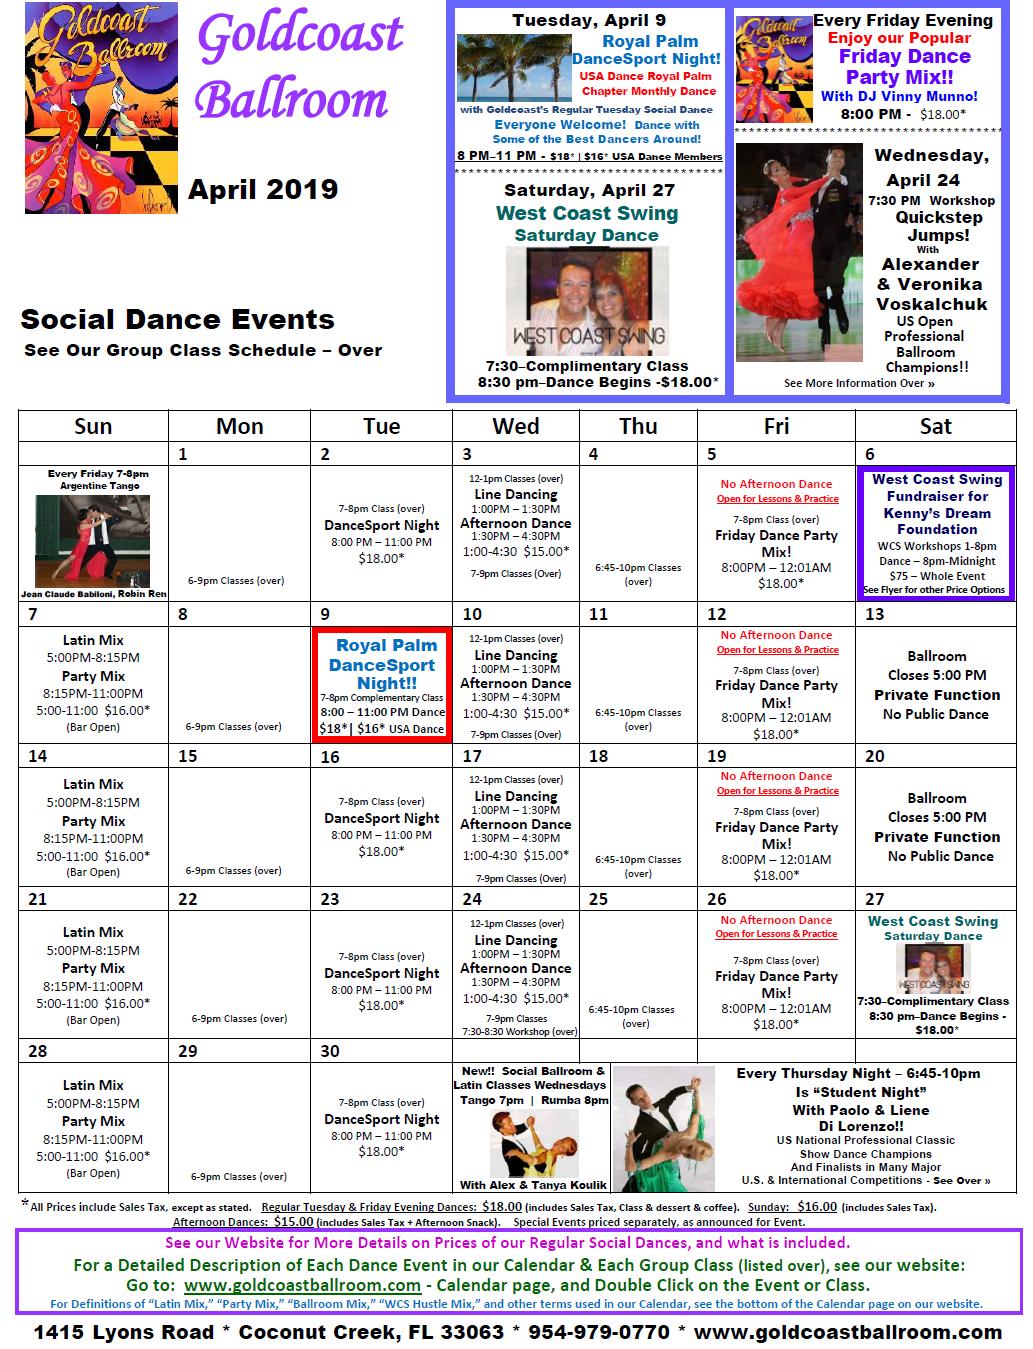 Goldcoast Ballroom April 2019 Calendar - Social Dance Events